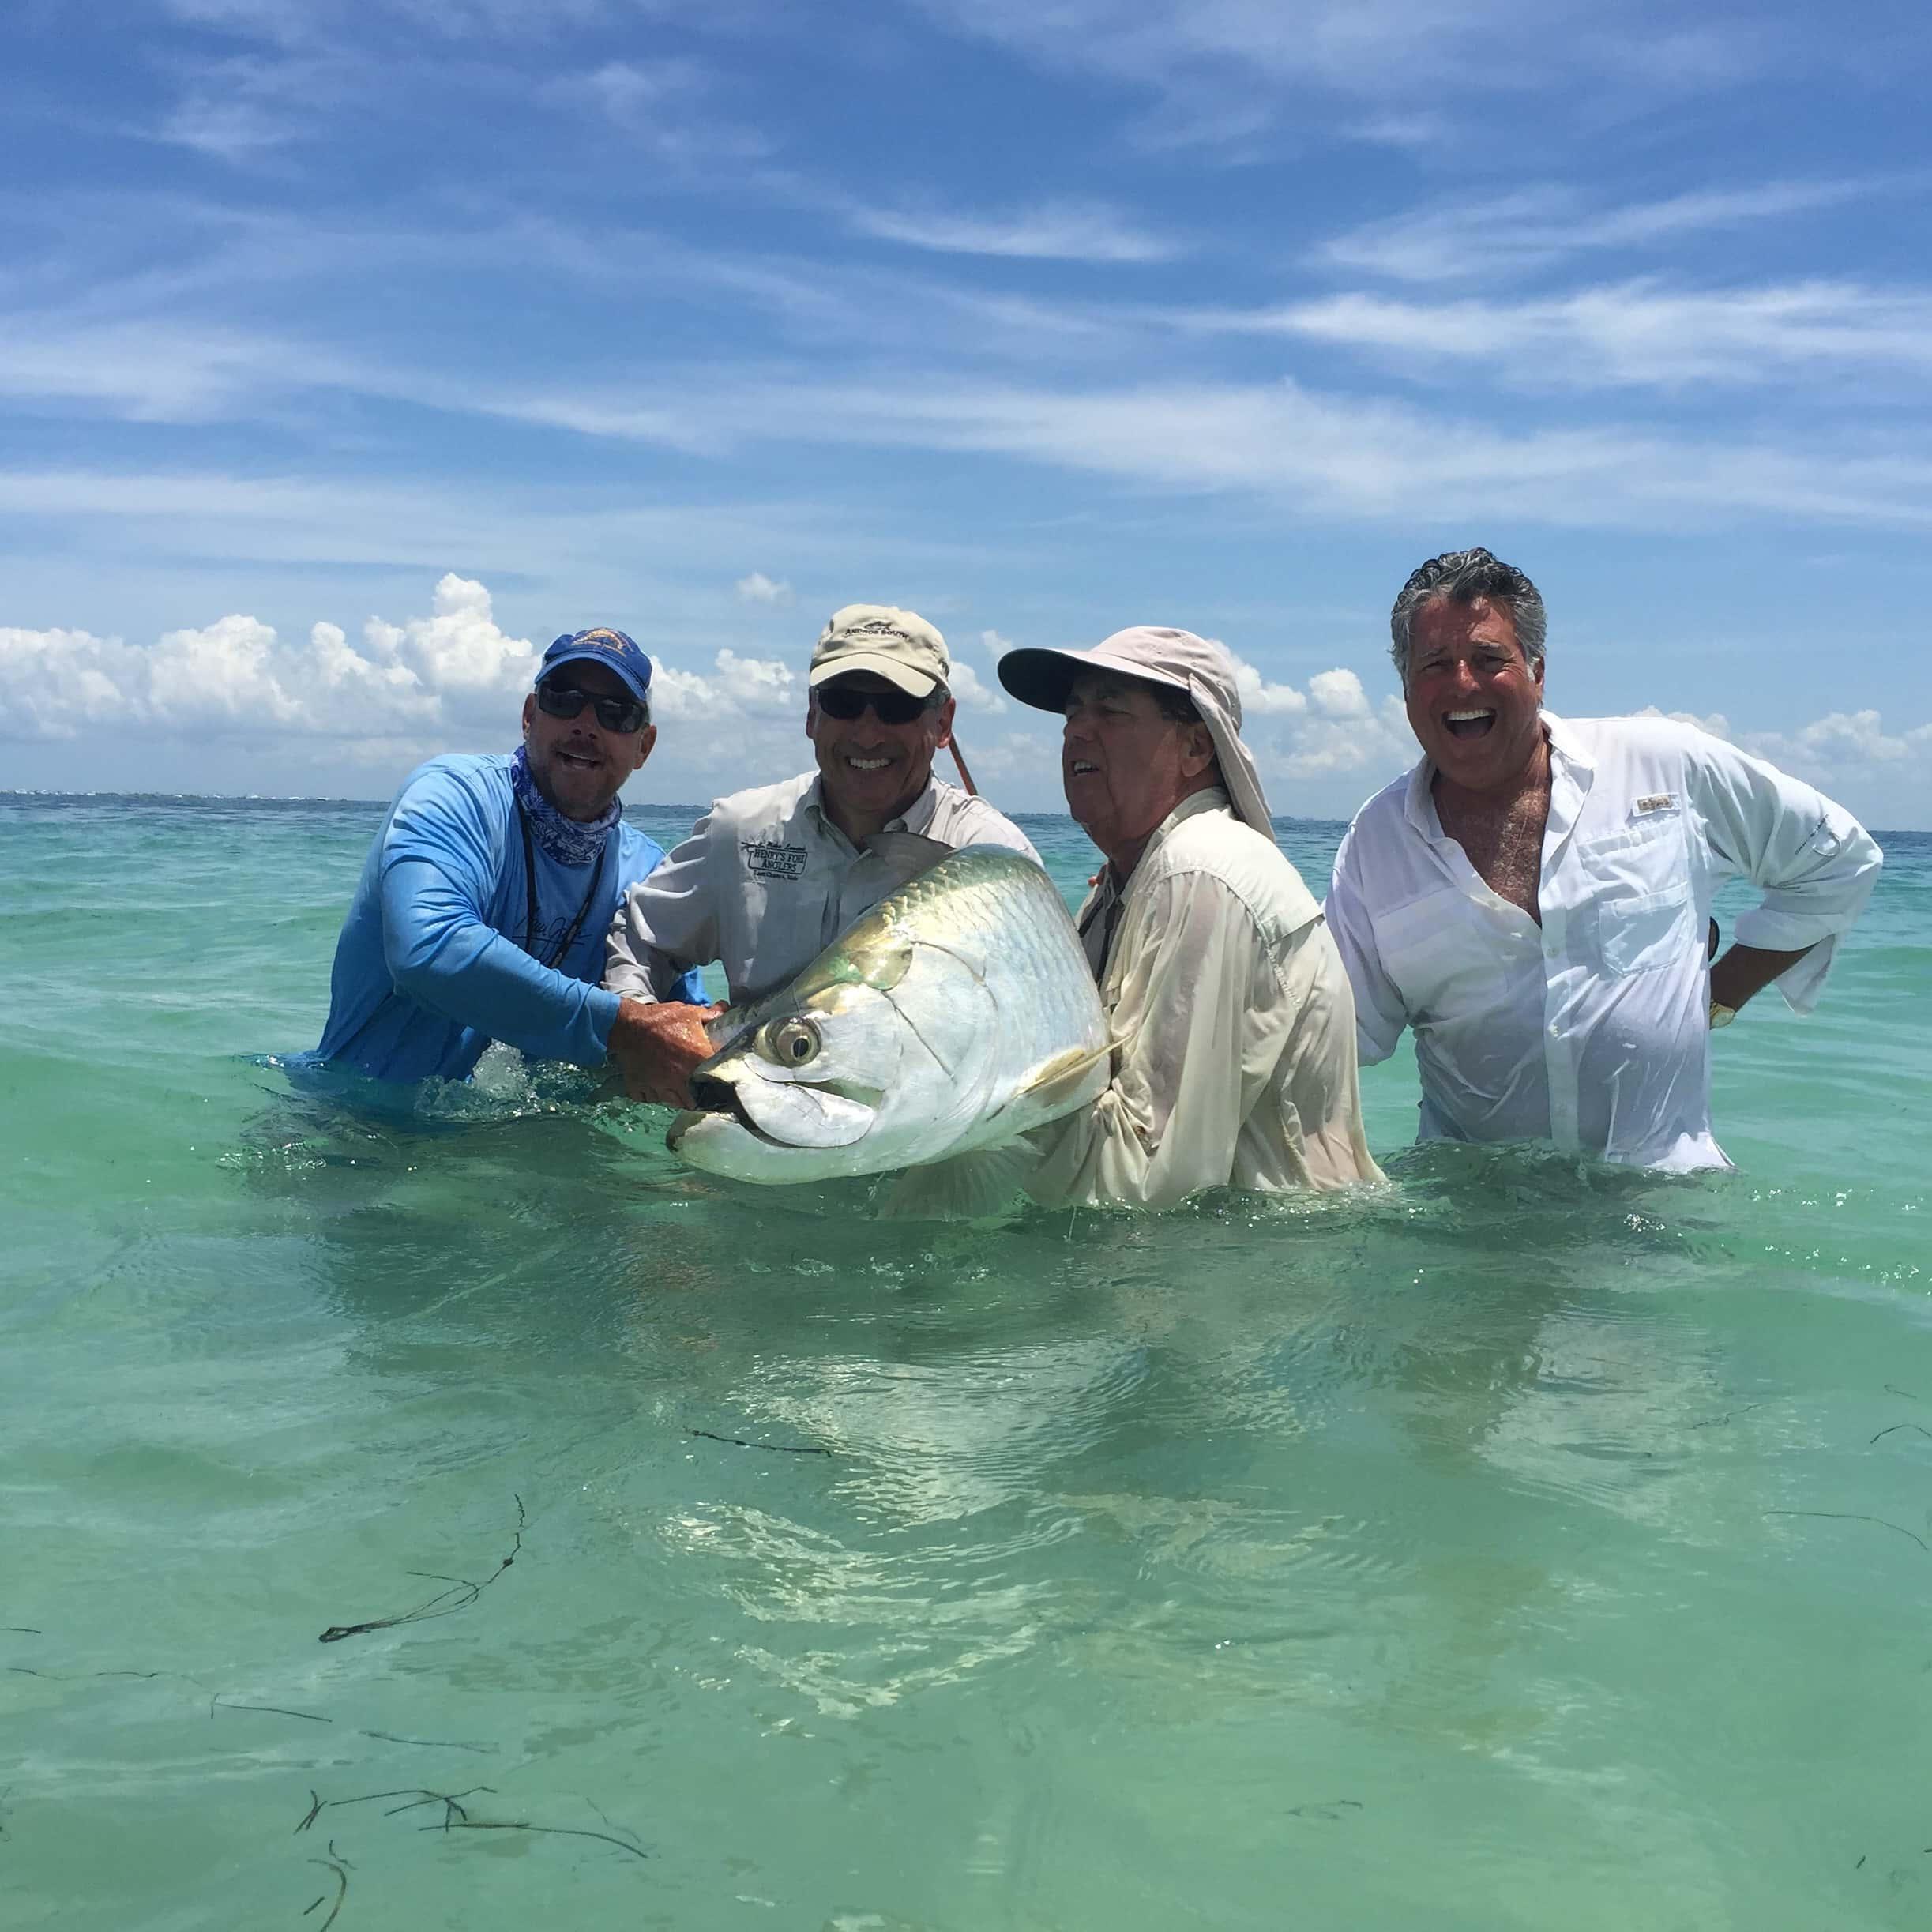 Shark tarpon redfish in tampa florida fishing charters for Florida fishing charters